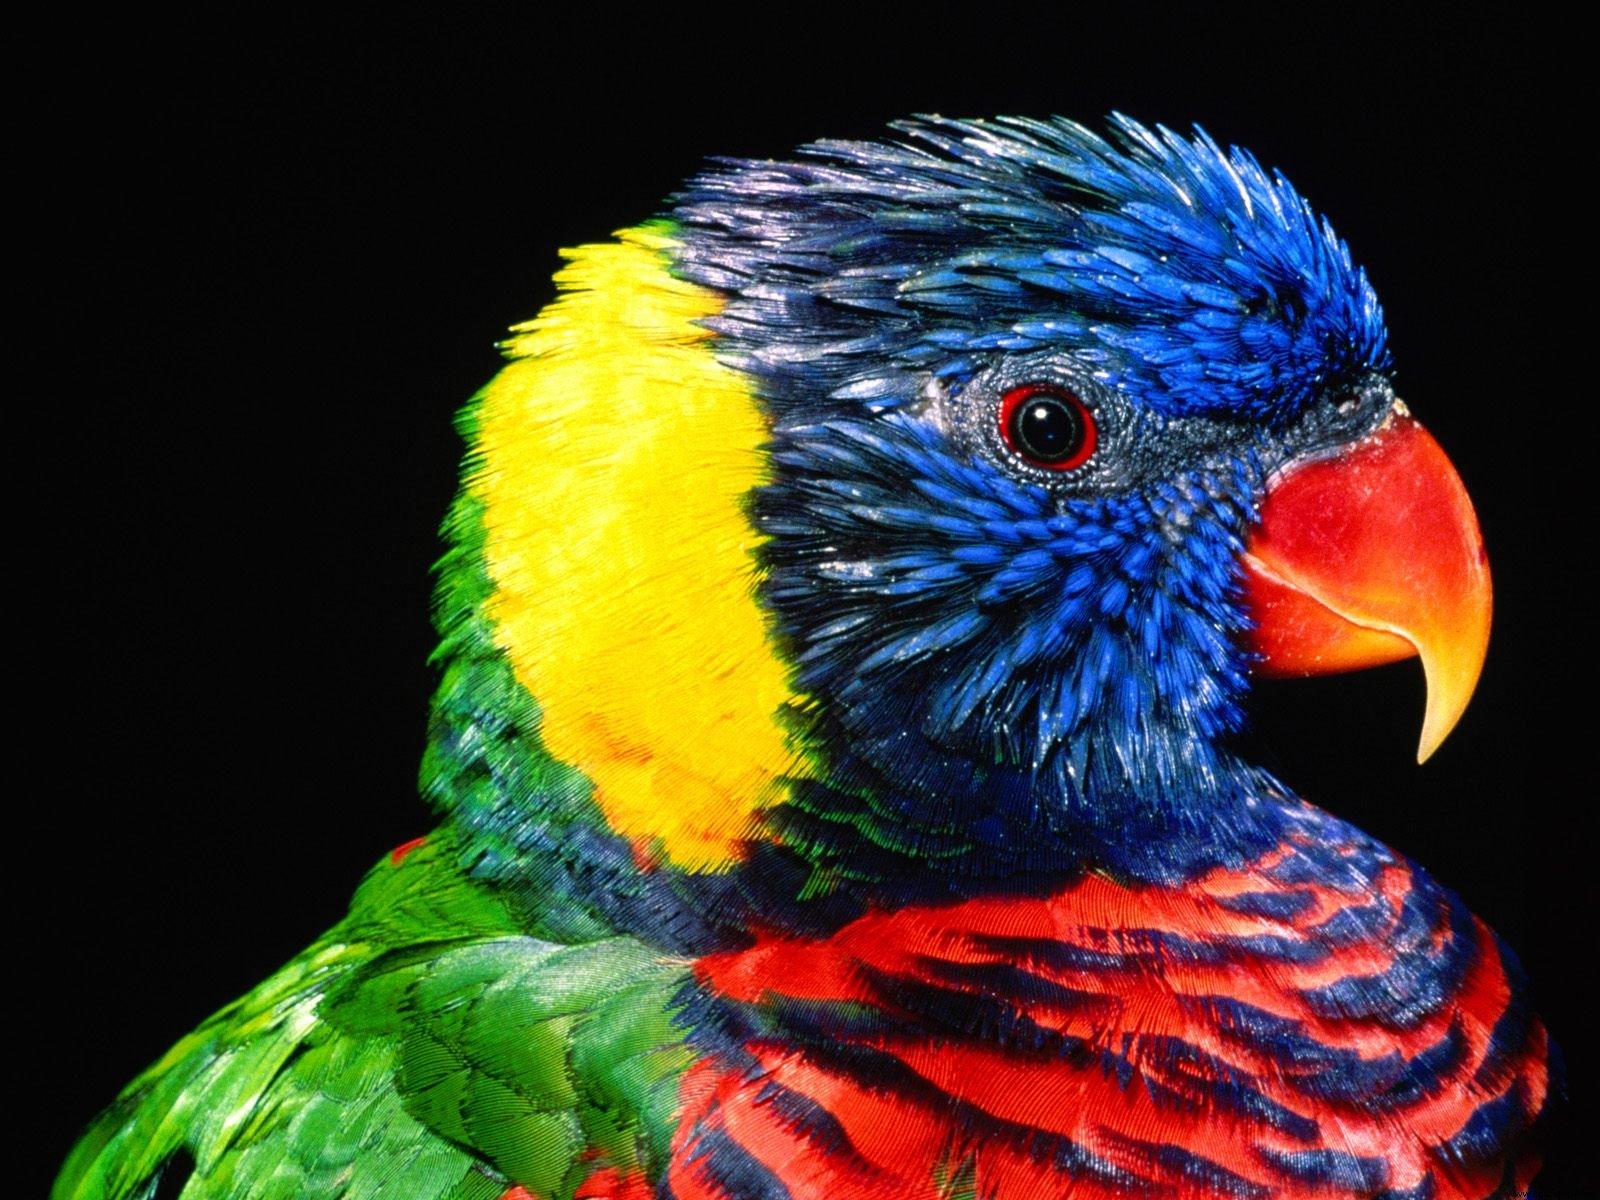 Birds Wallpaper Parrot Owl Eagle Ostrich Inspirational Quotes 1600x1200